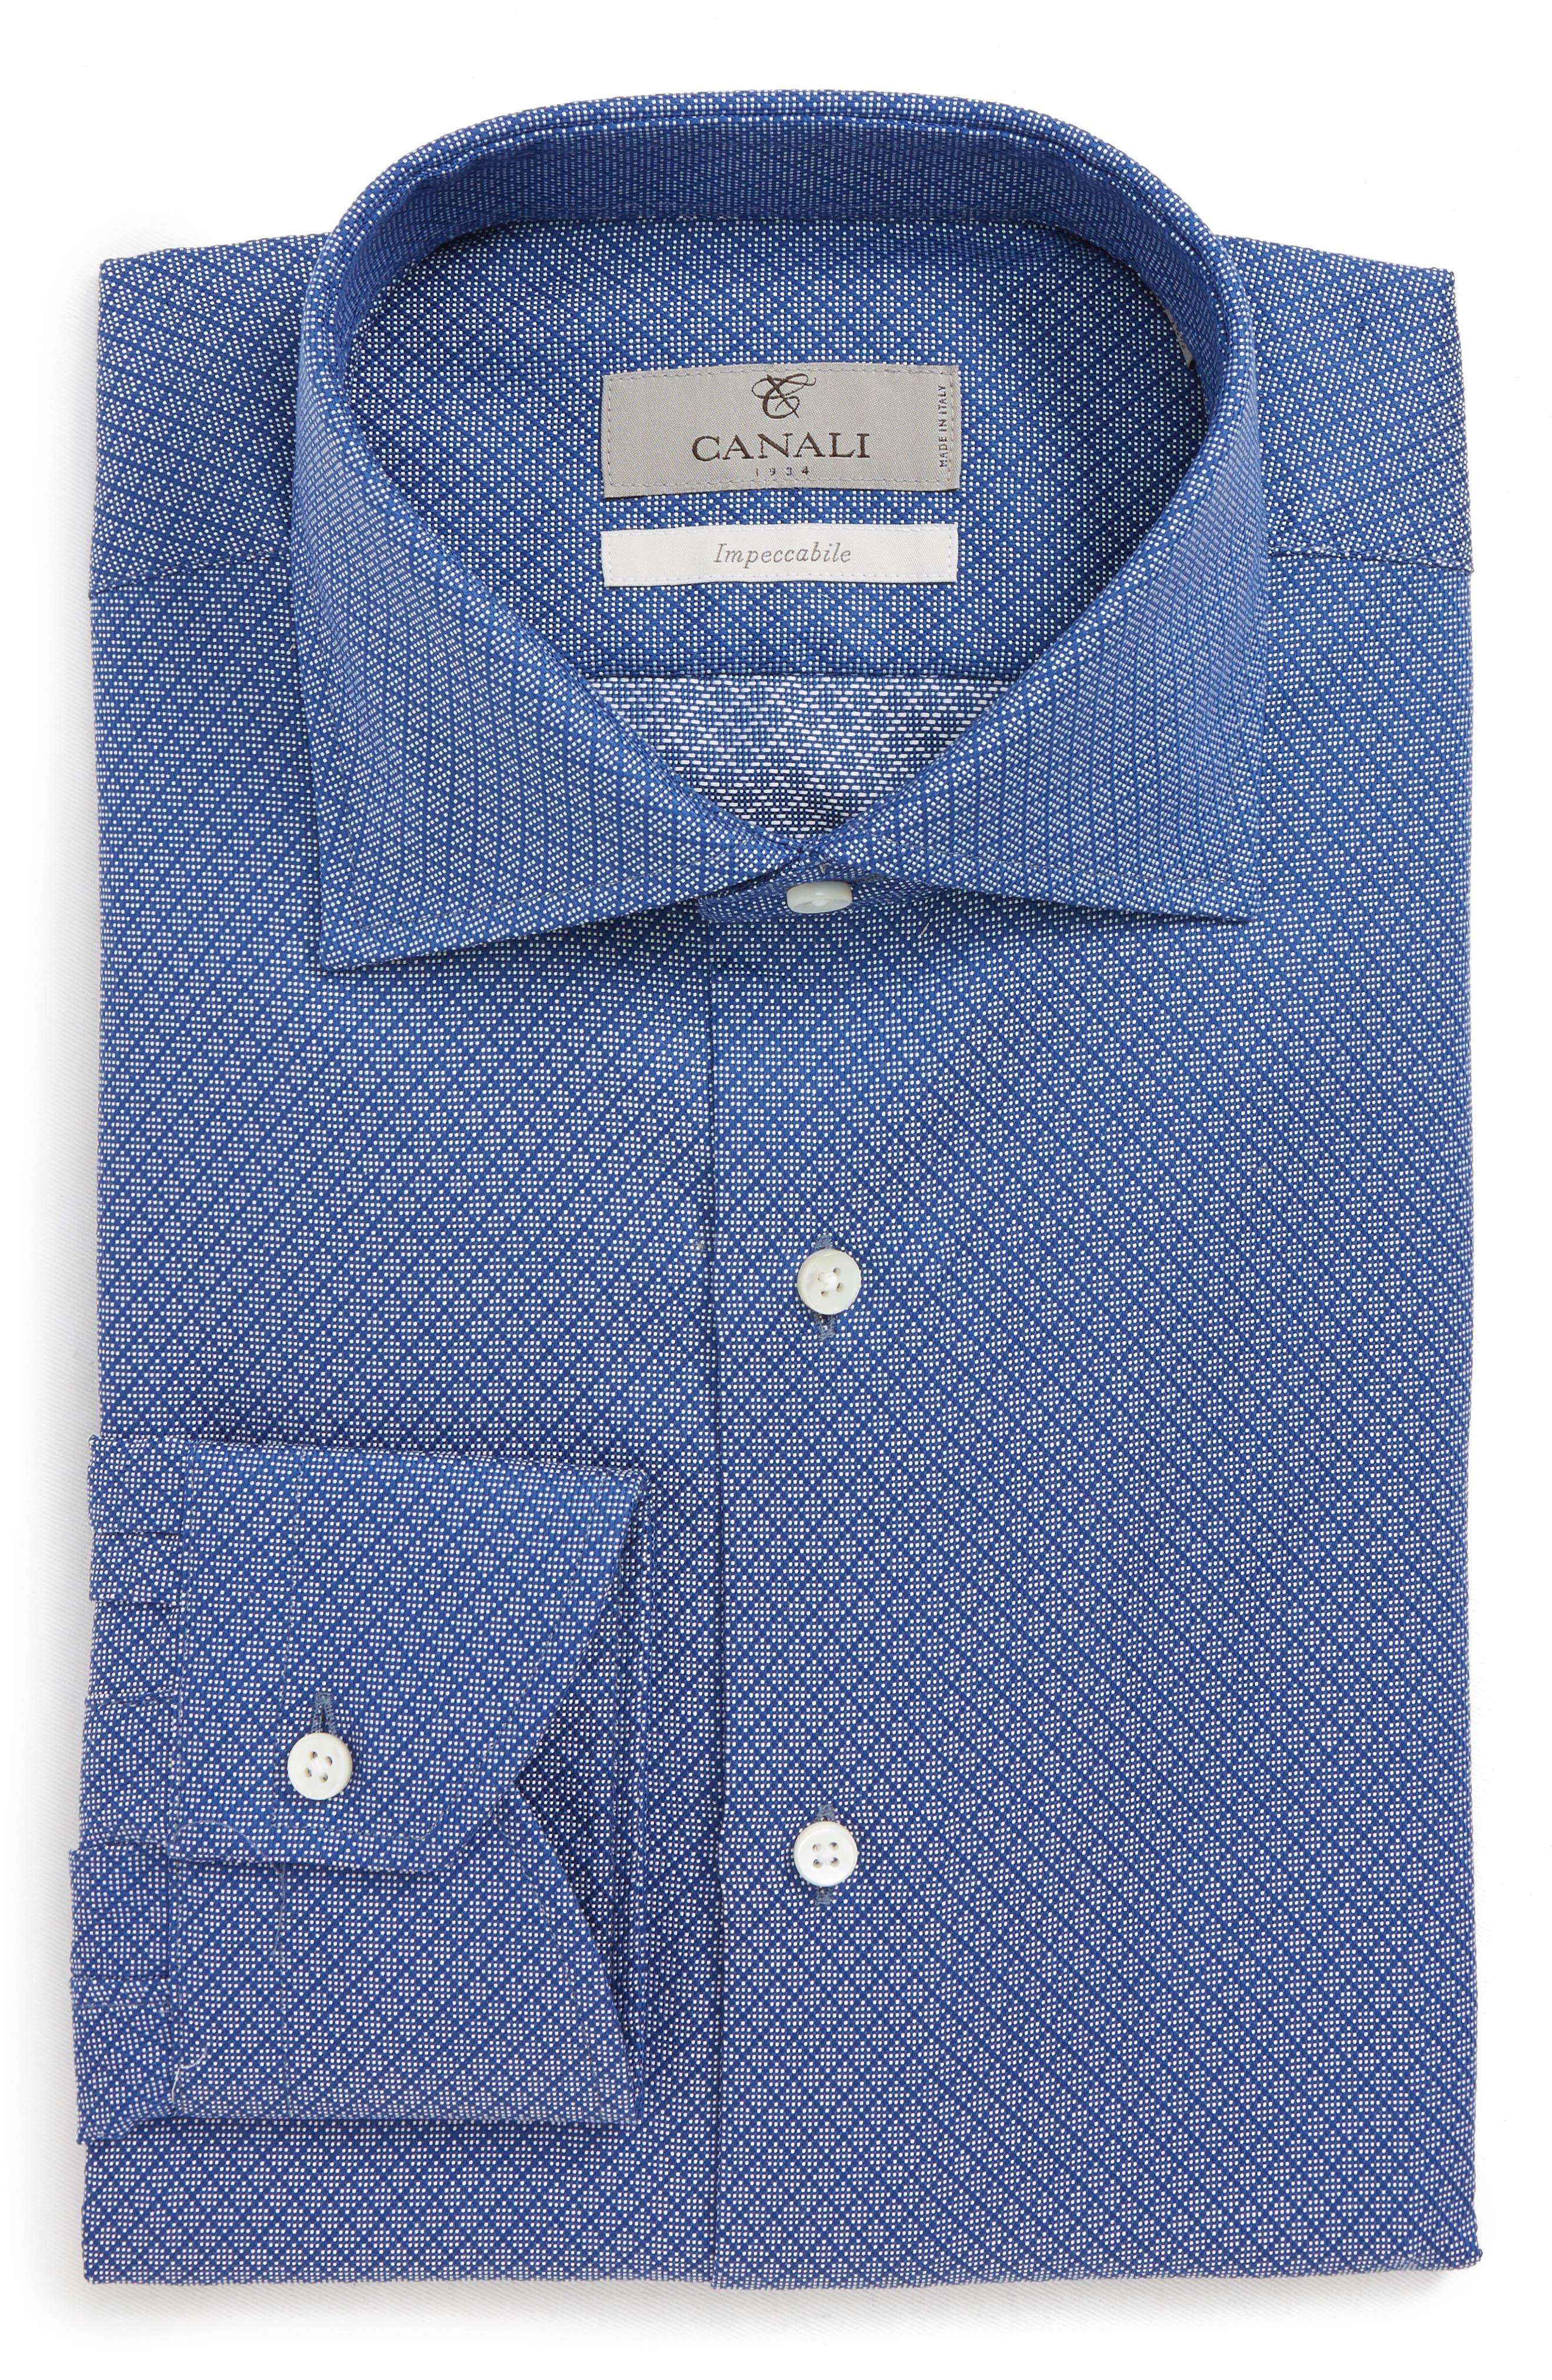 Trim Fit Print Dress Shirt,                             Main thumbnail 1, color,                             DARK BLUE